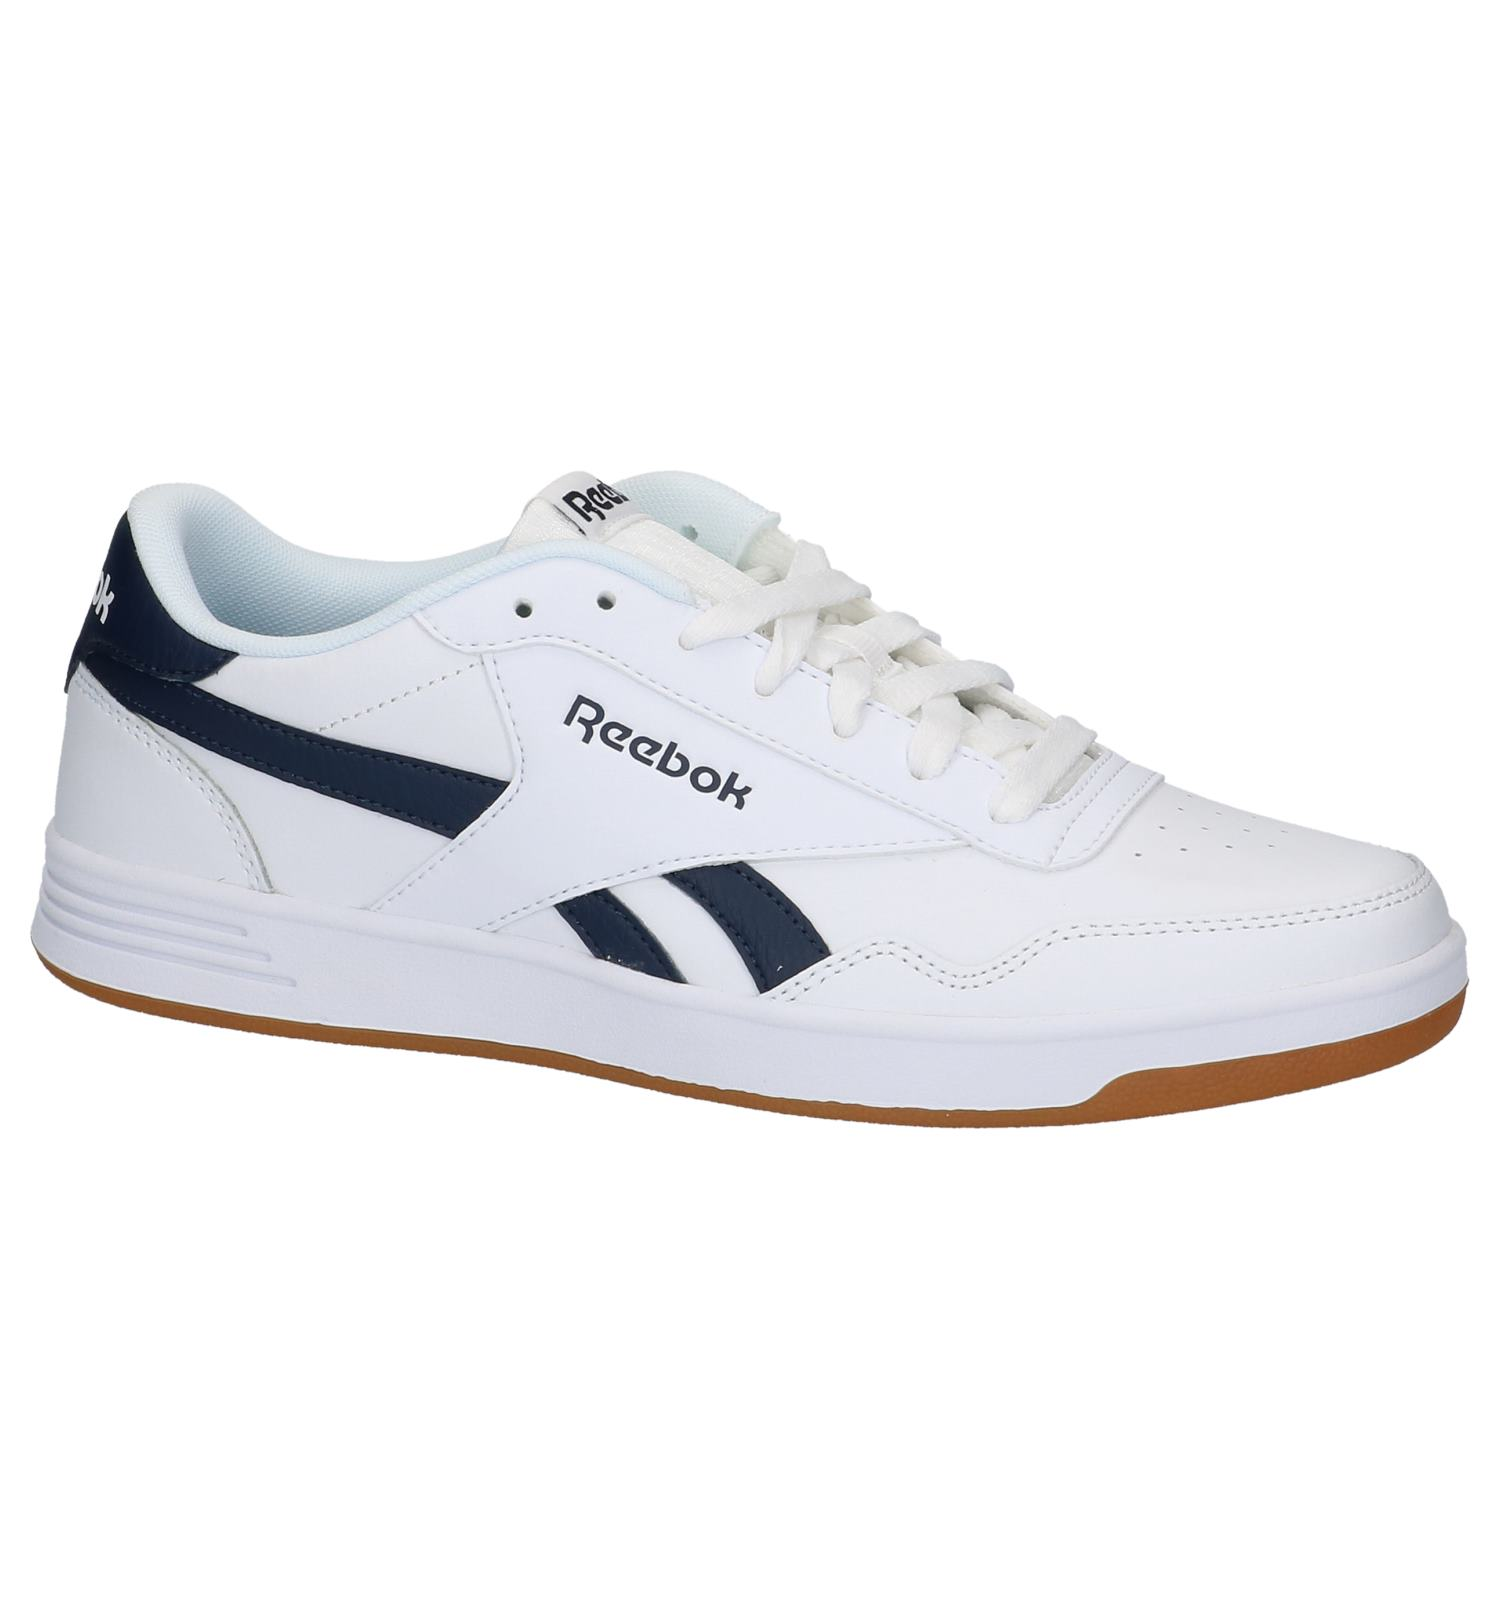 Reebok Royal Techqu Witte Lage Sportieve Sneakers | TORFS.BE | Gratis verzend en retour